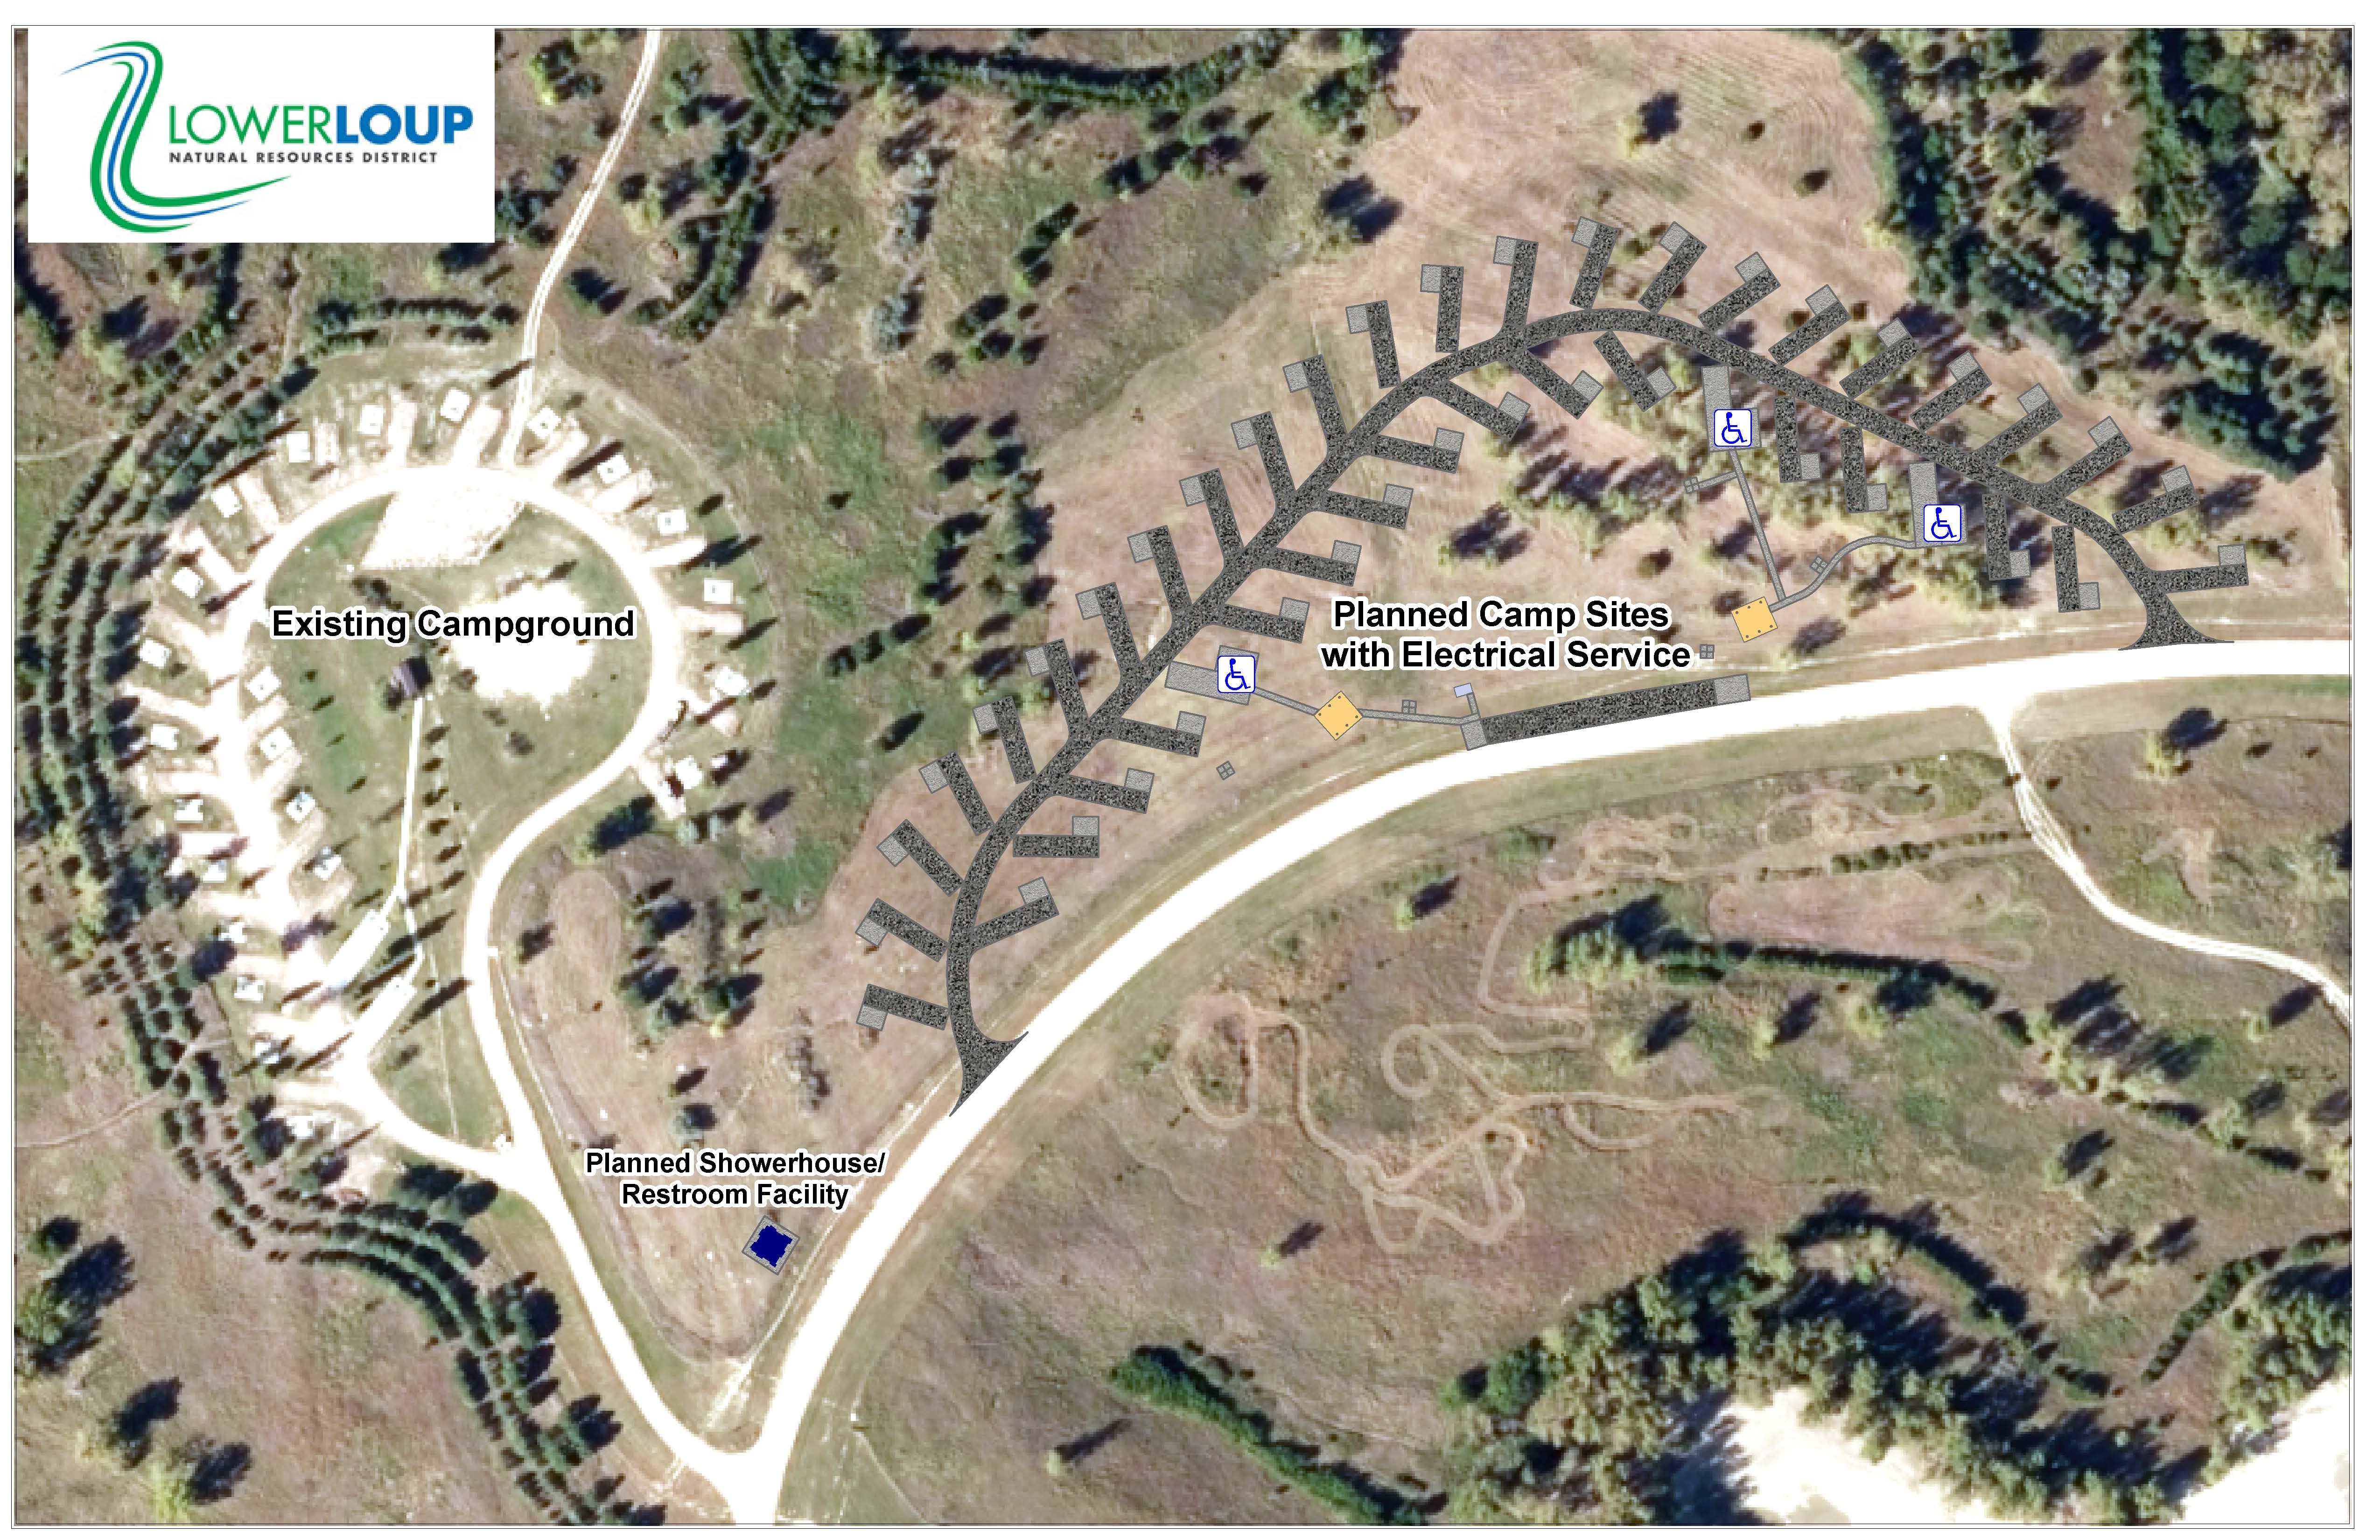 Davis Creek Recreation Area Improvements Okayed   Lower Loup